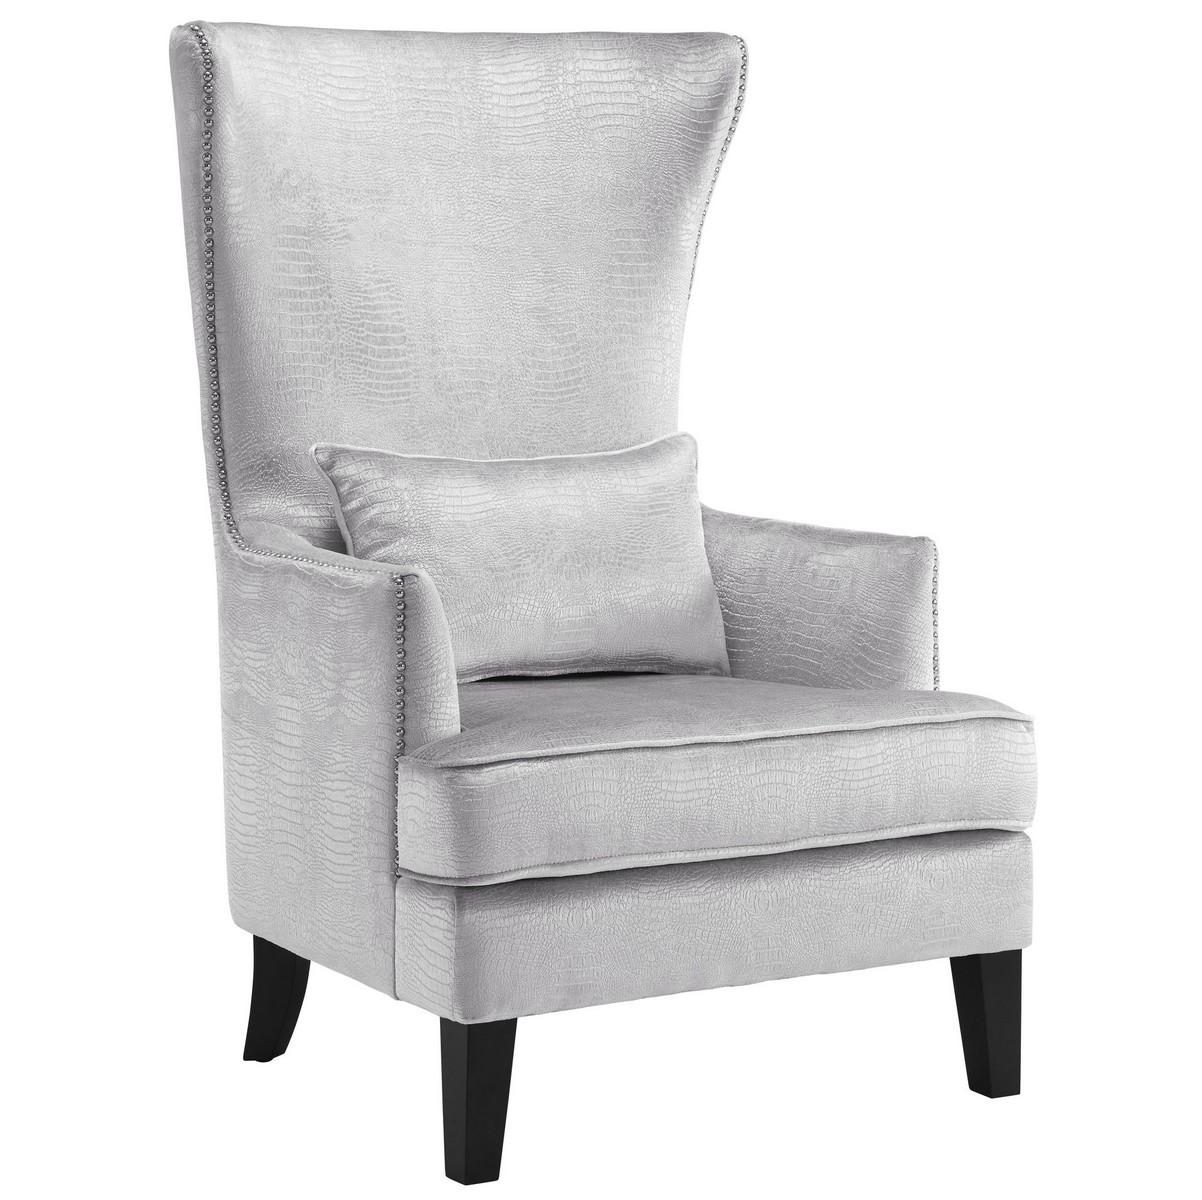 TOV Furniture Bristol Silver Croc Tall Chair